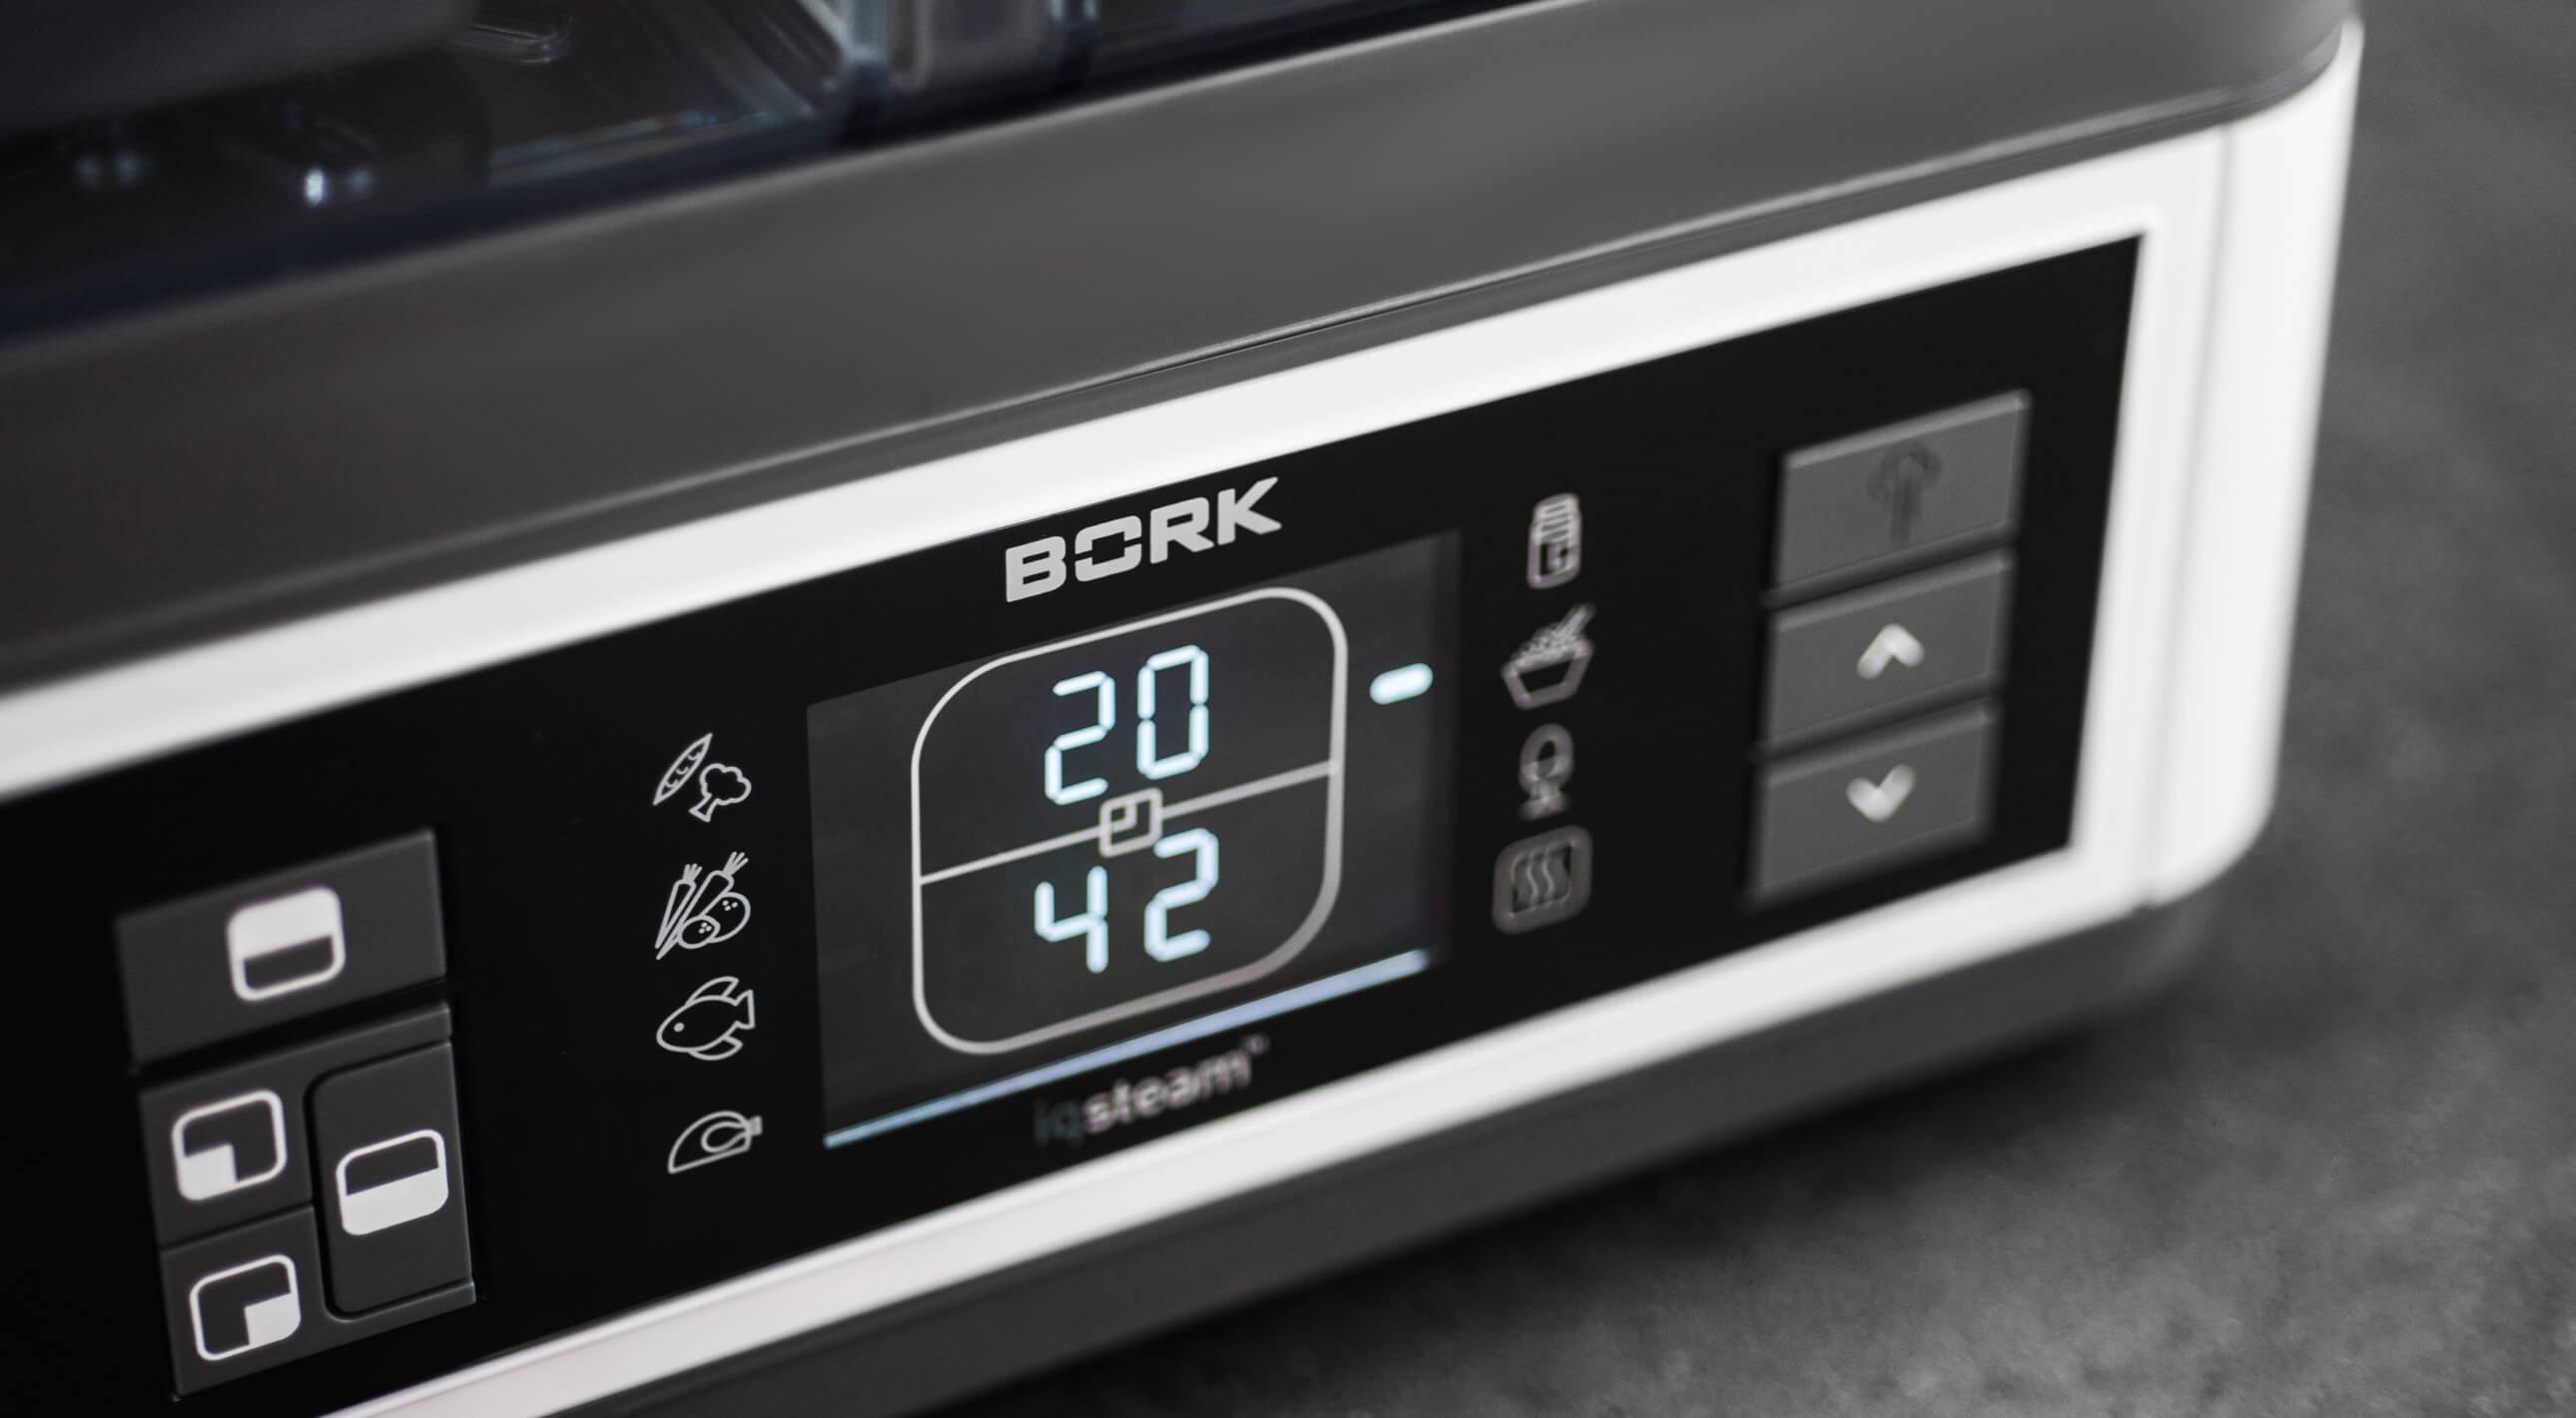 Дисплей пароварки Bork F700